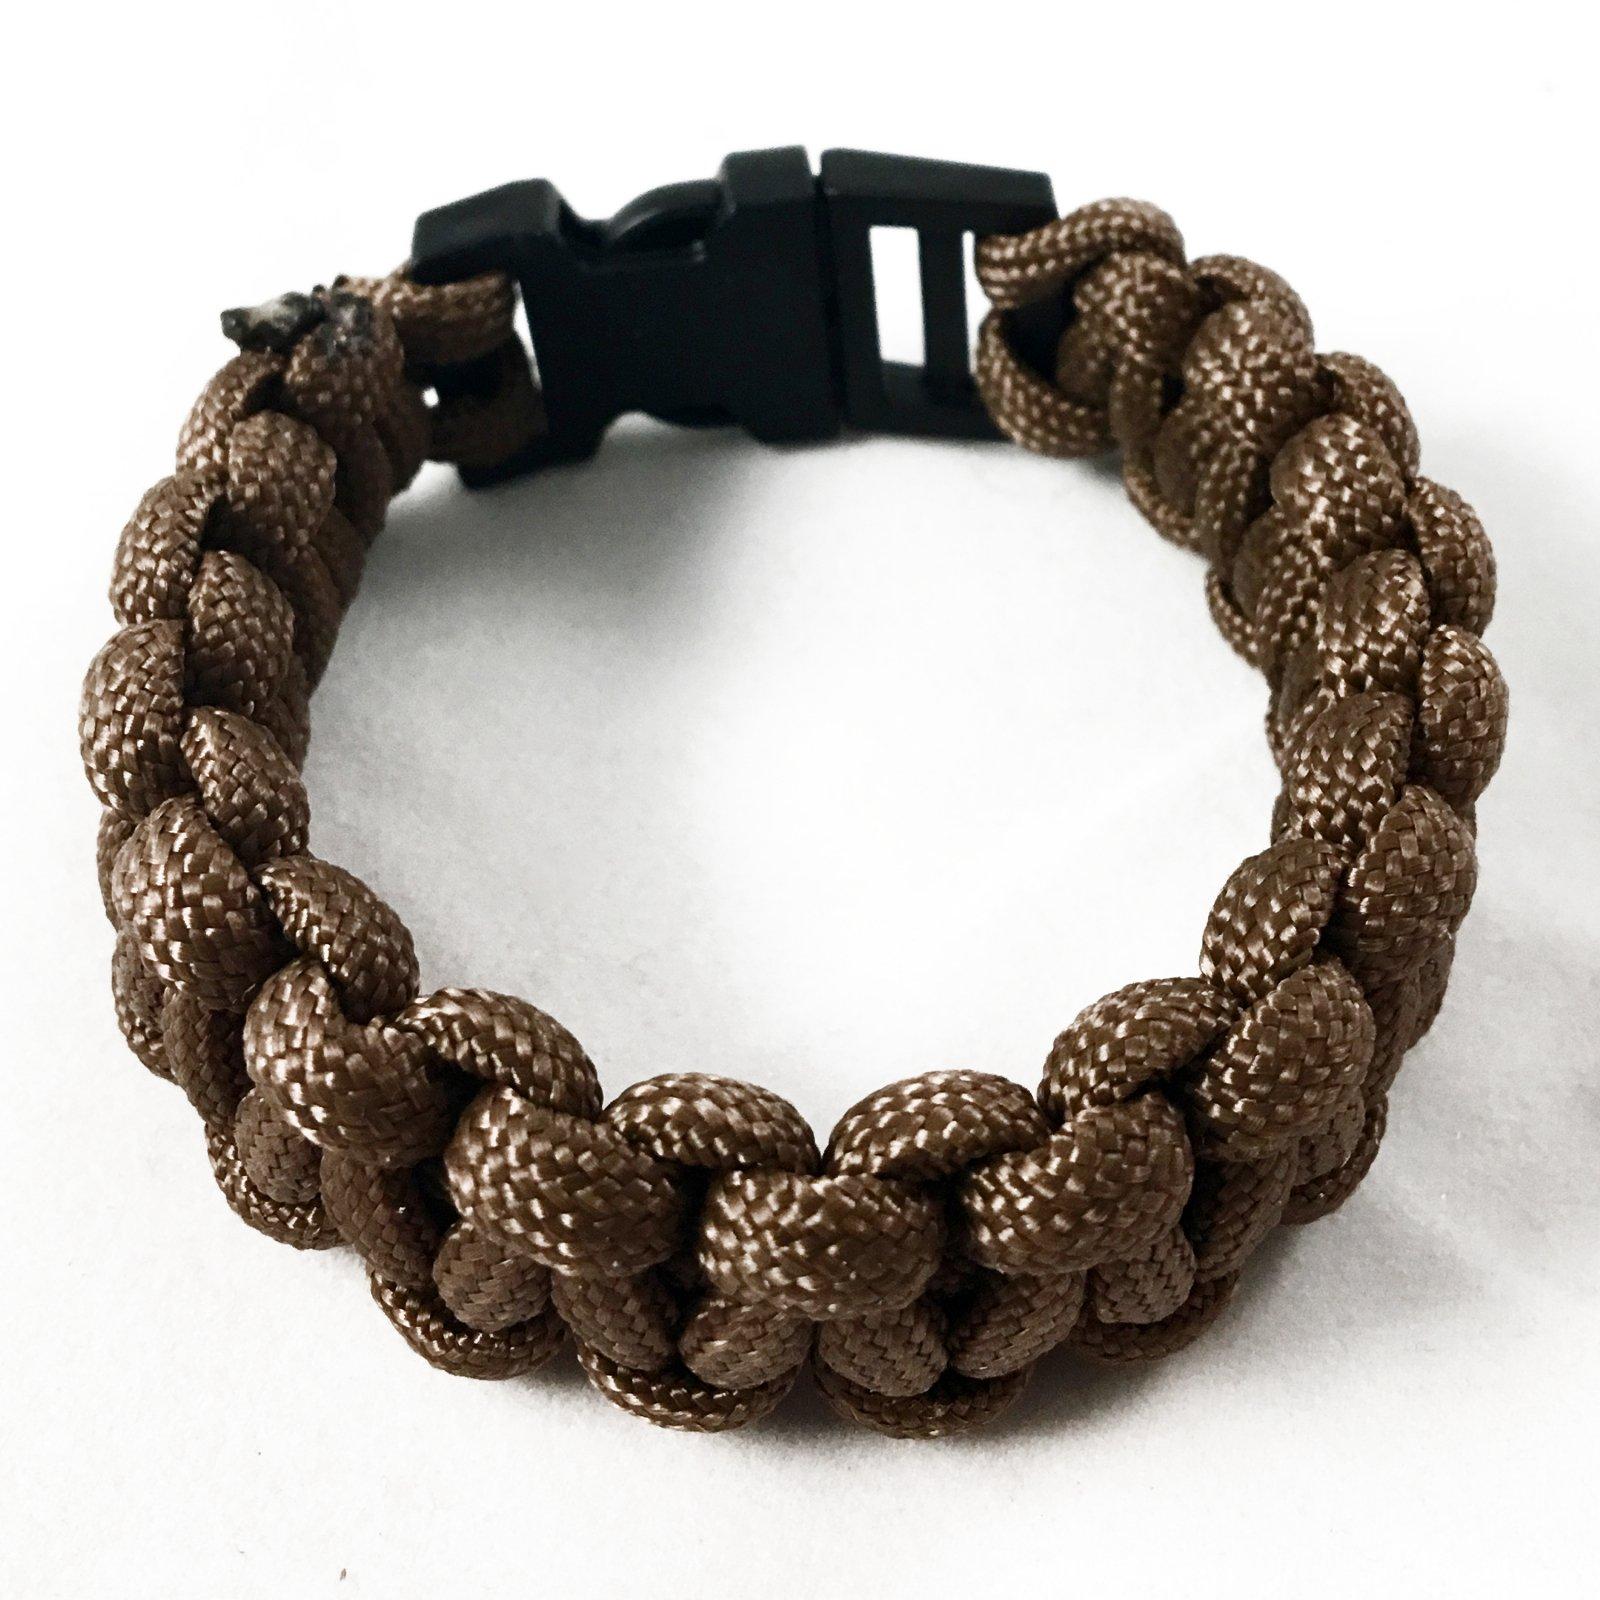 ASR Outdoor - Paracord Bracelet - Brown